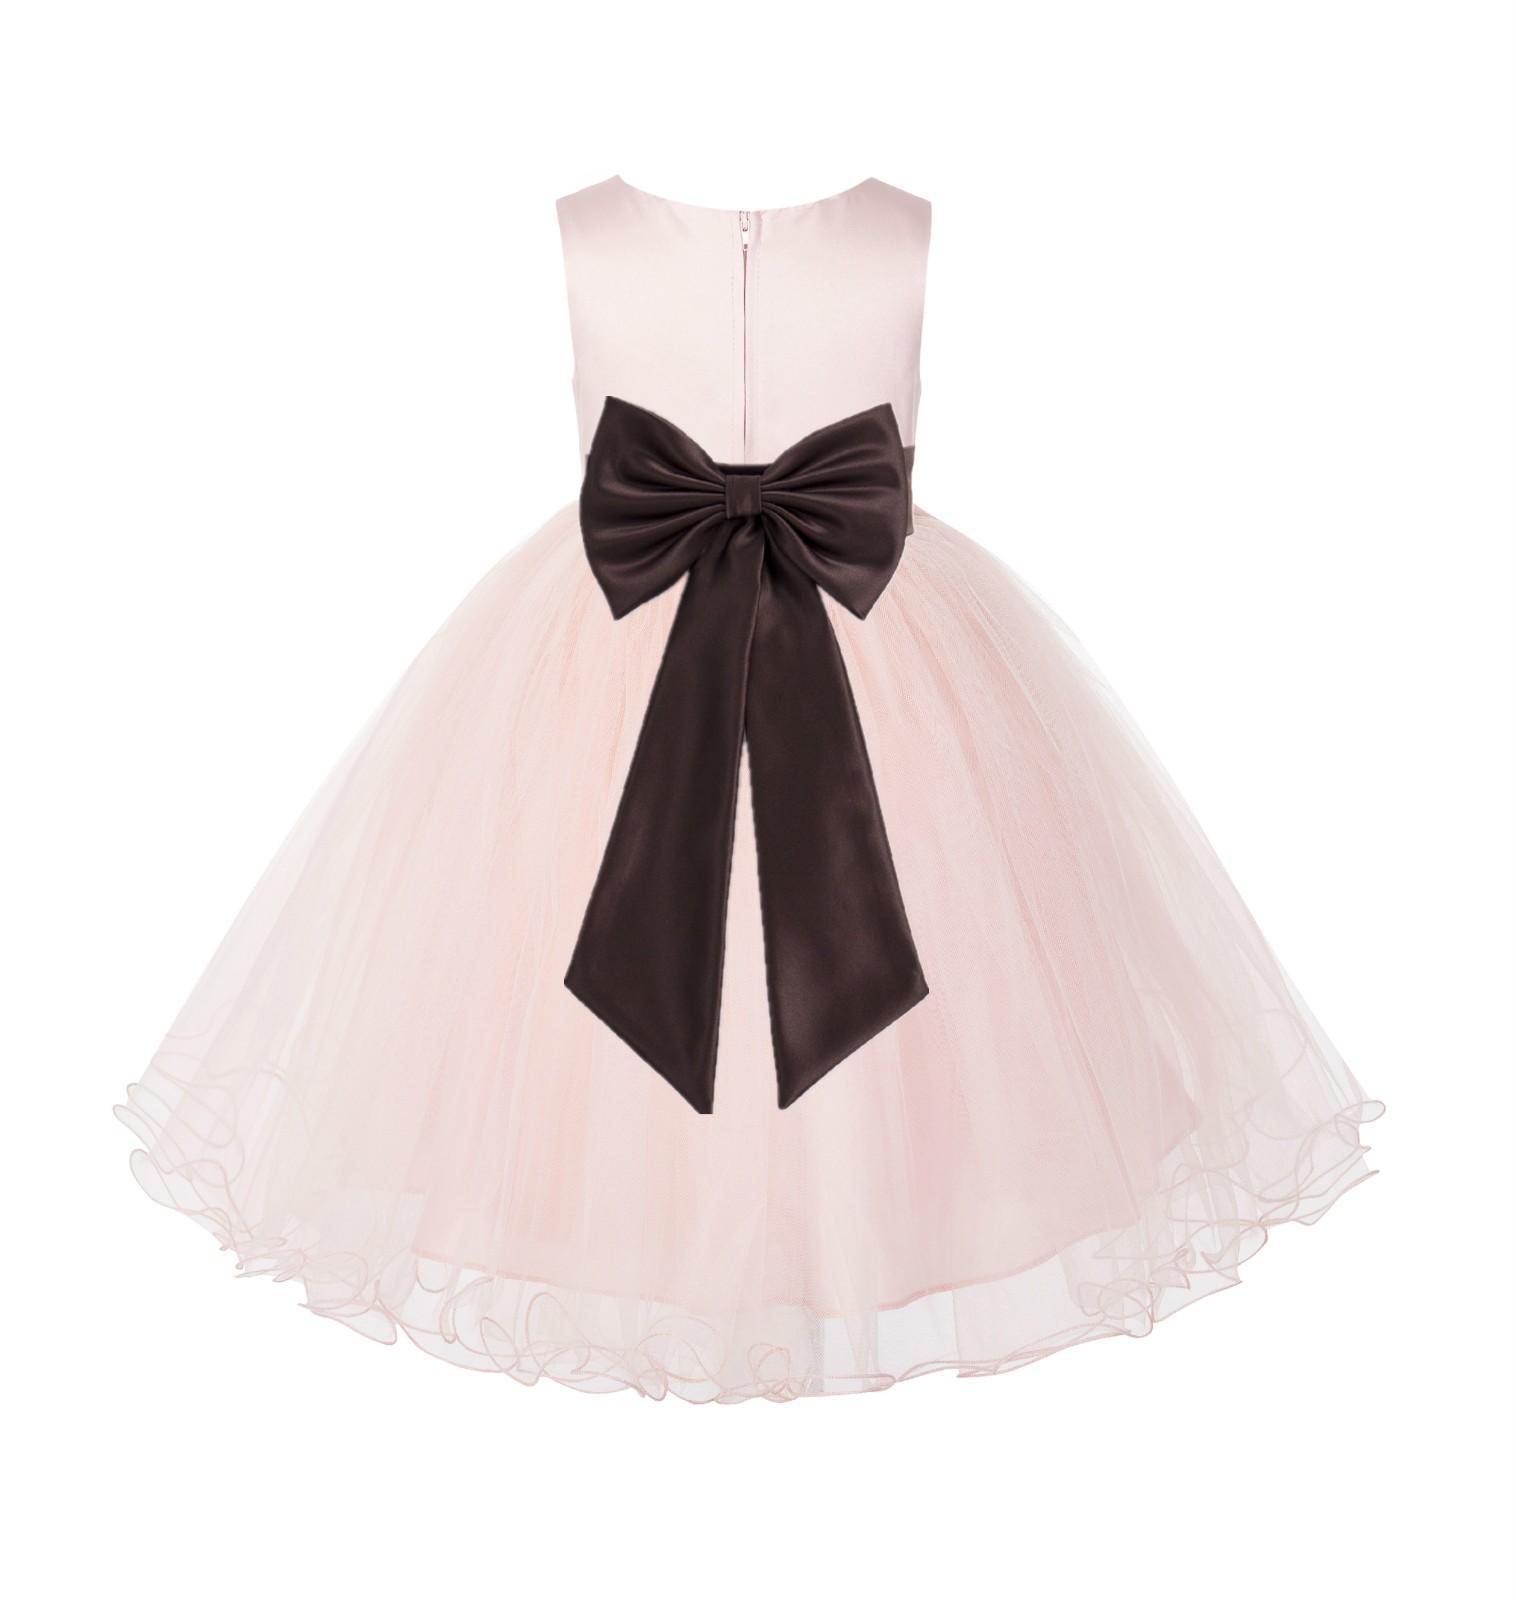 Blush PInk / Brown Tulle Rattail Edge Flower Girl Dress Wedding Bridesmaid 829T